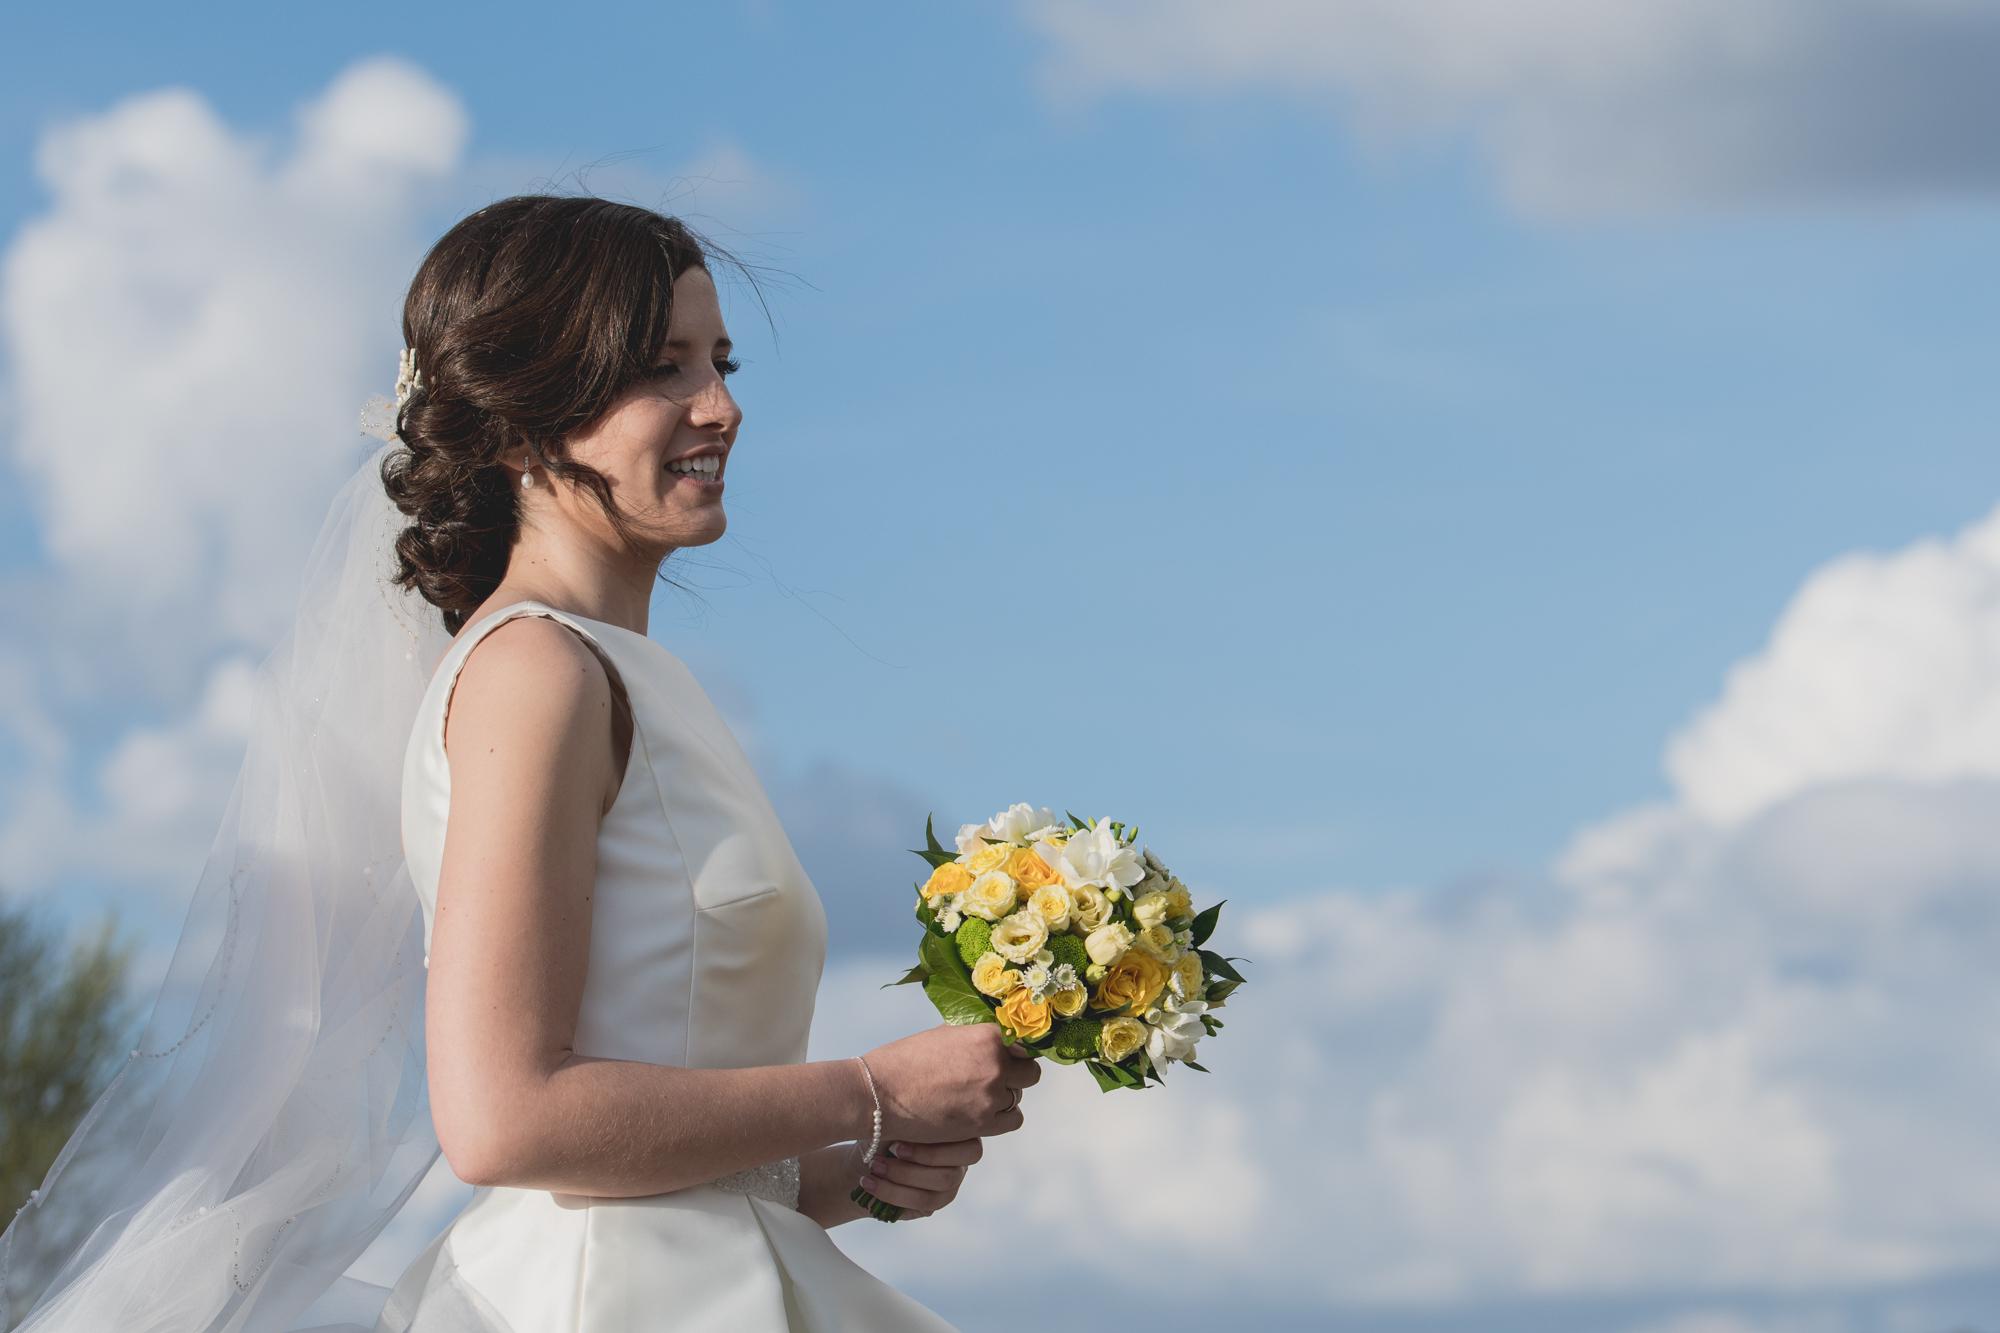 fotografos-de-boda-madrid.jpg